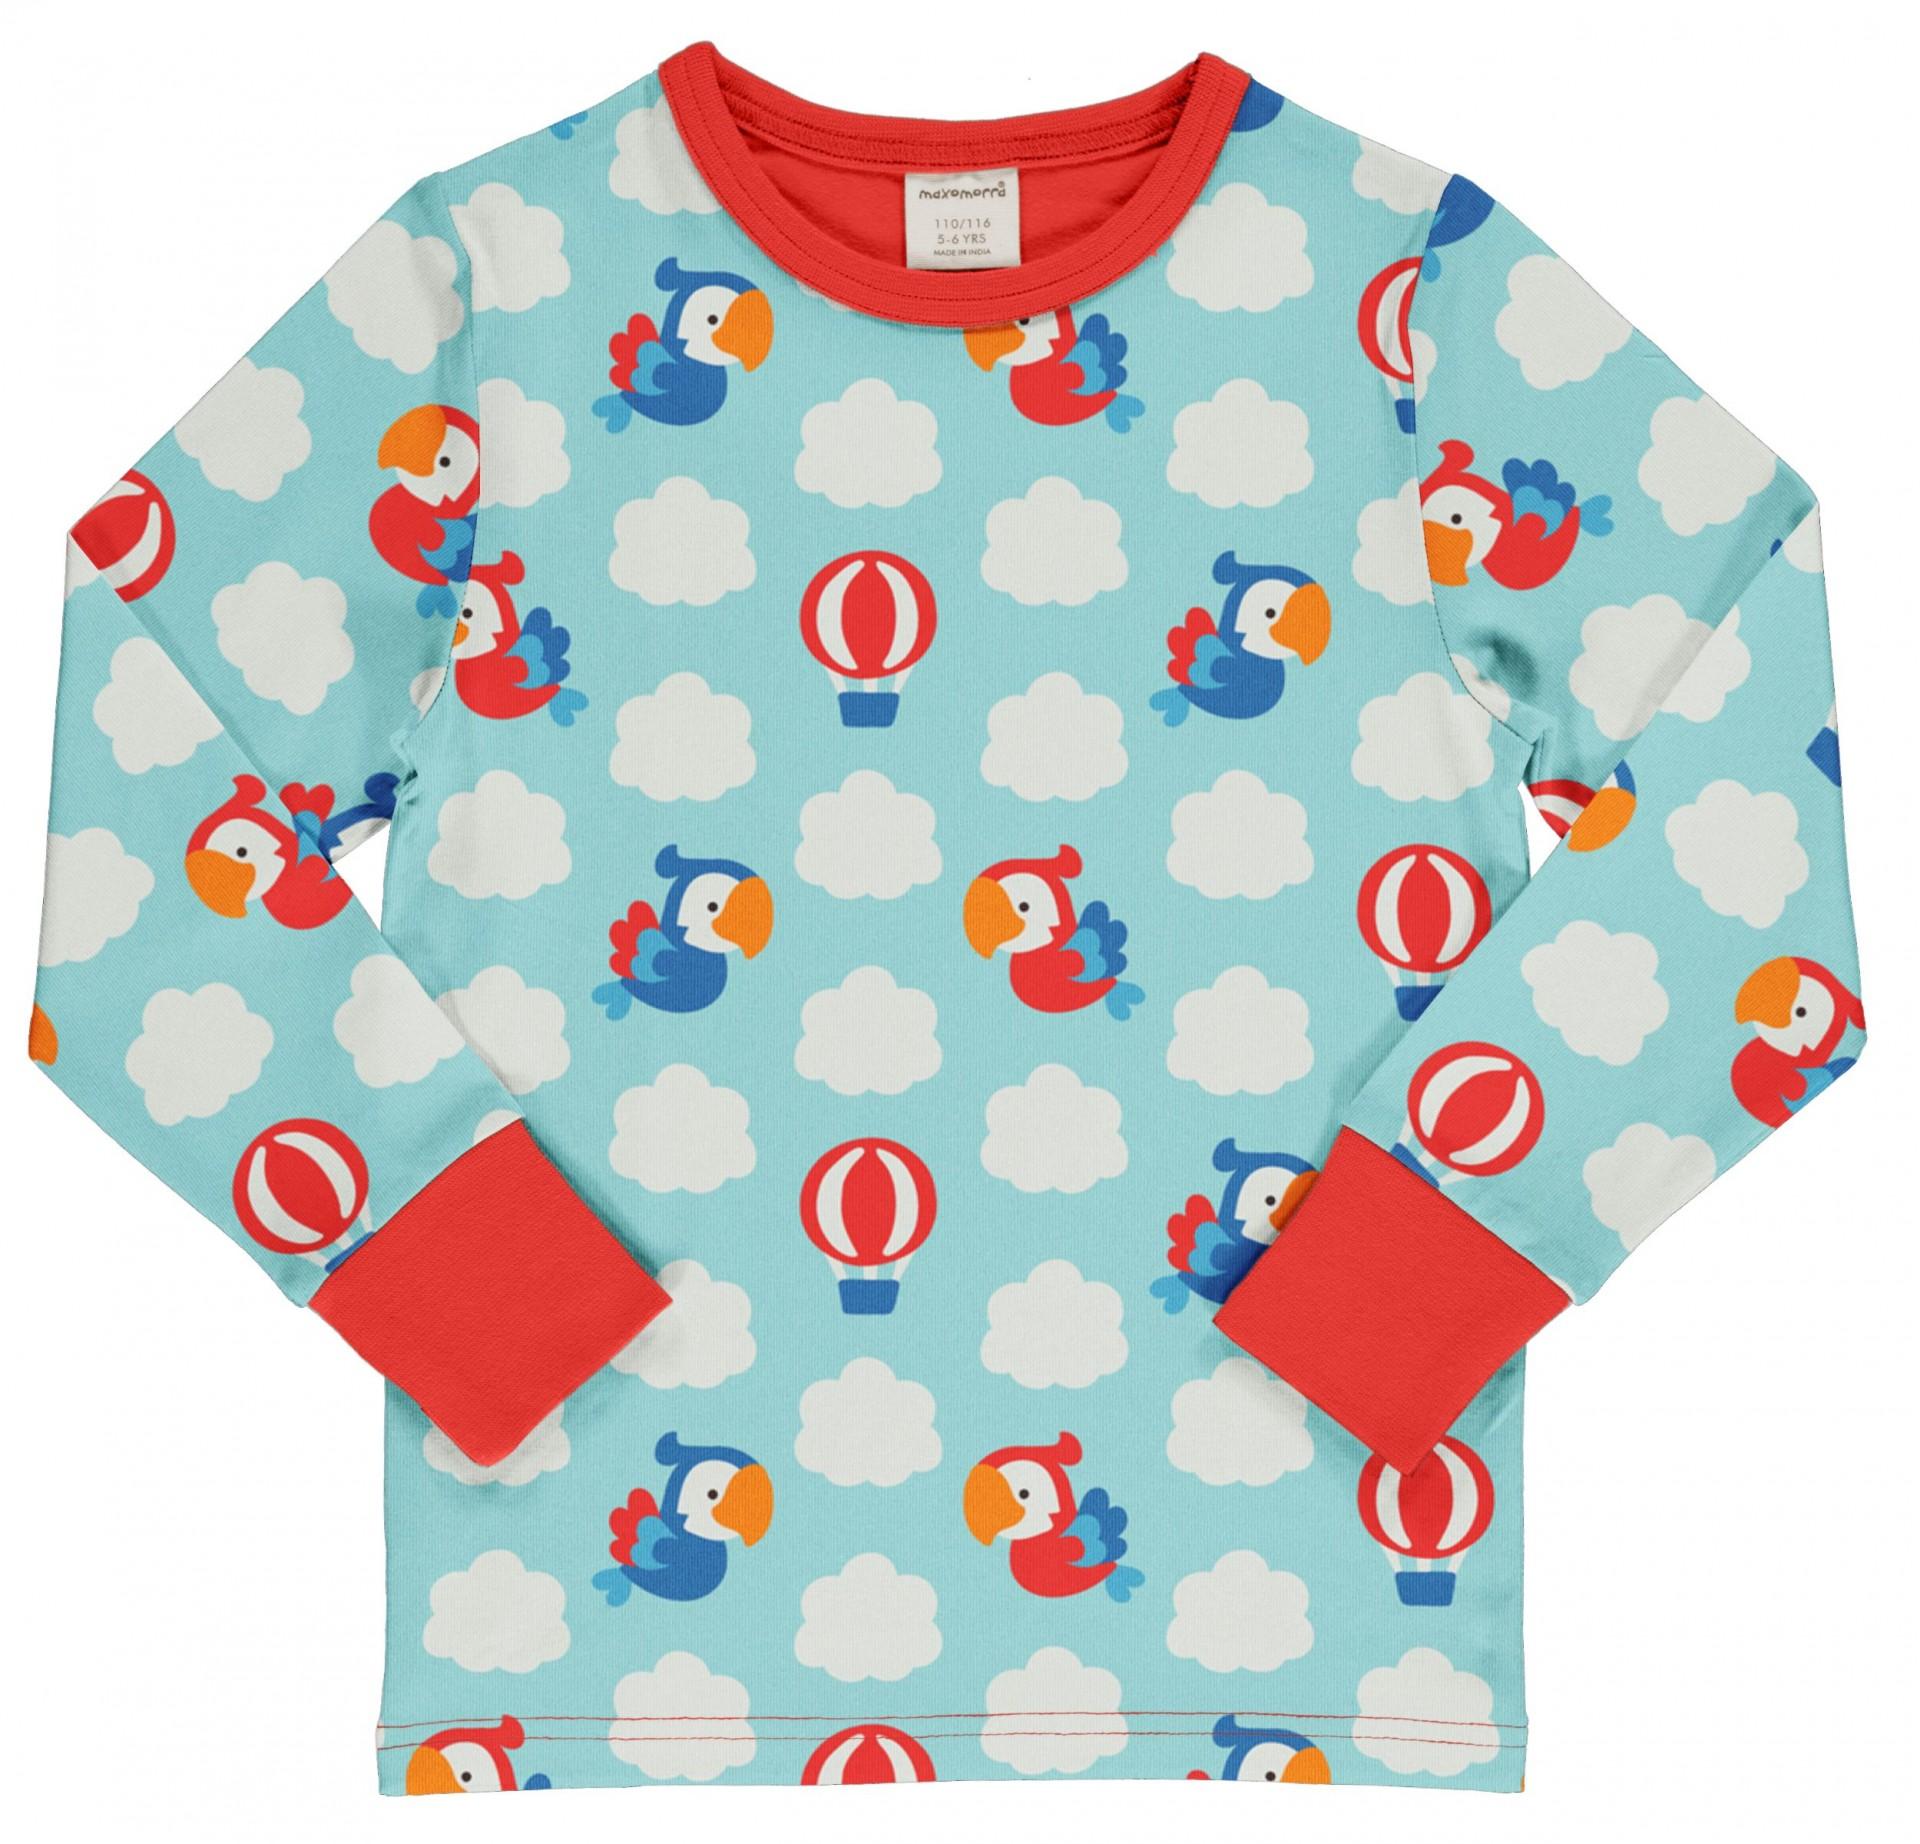 Camisola PARROT SAFARI Maxomorra (Tamanhos disponíveis 9-12m, 18-24m, 7-8a)